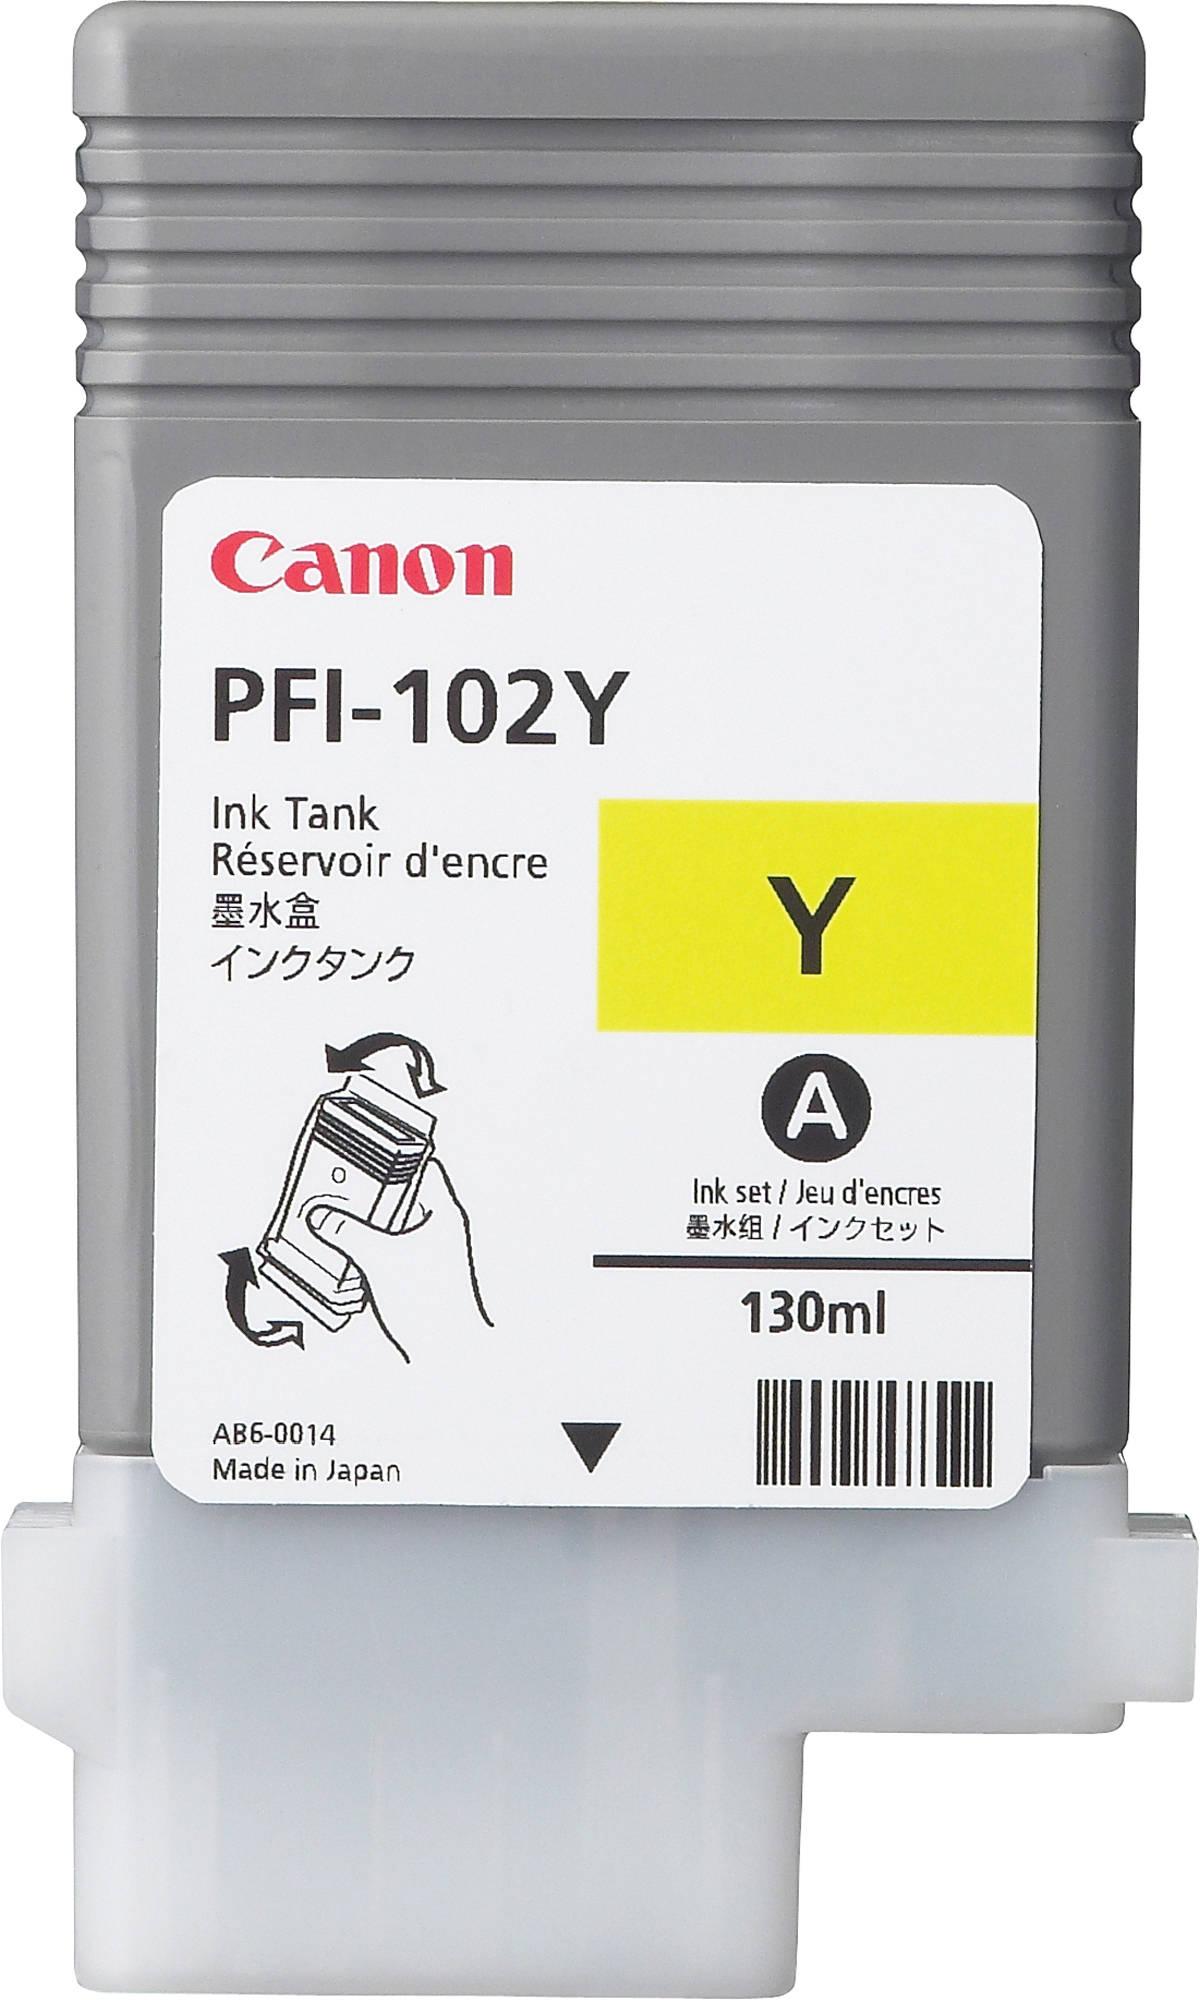 Canon PFI-102Y (0898B001) - картридж для принтеров Canon iPF500/600/610/700/710 (Yellow)